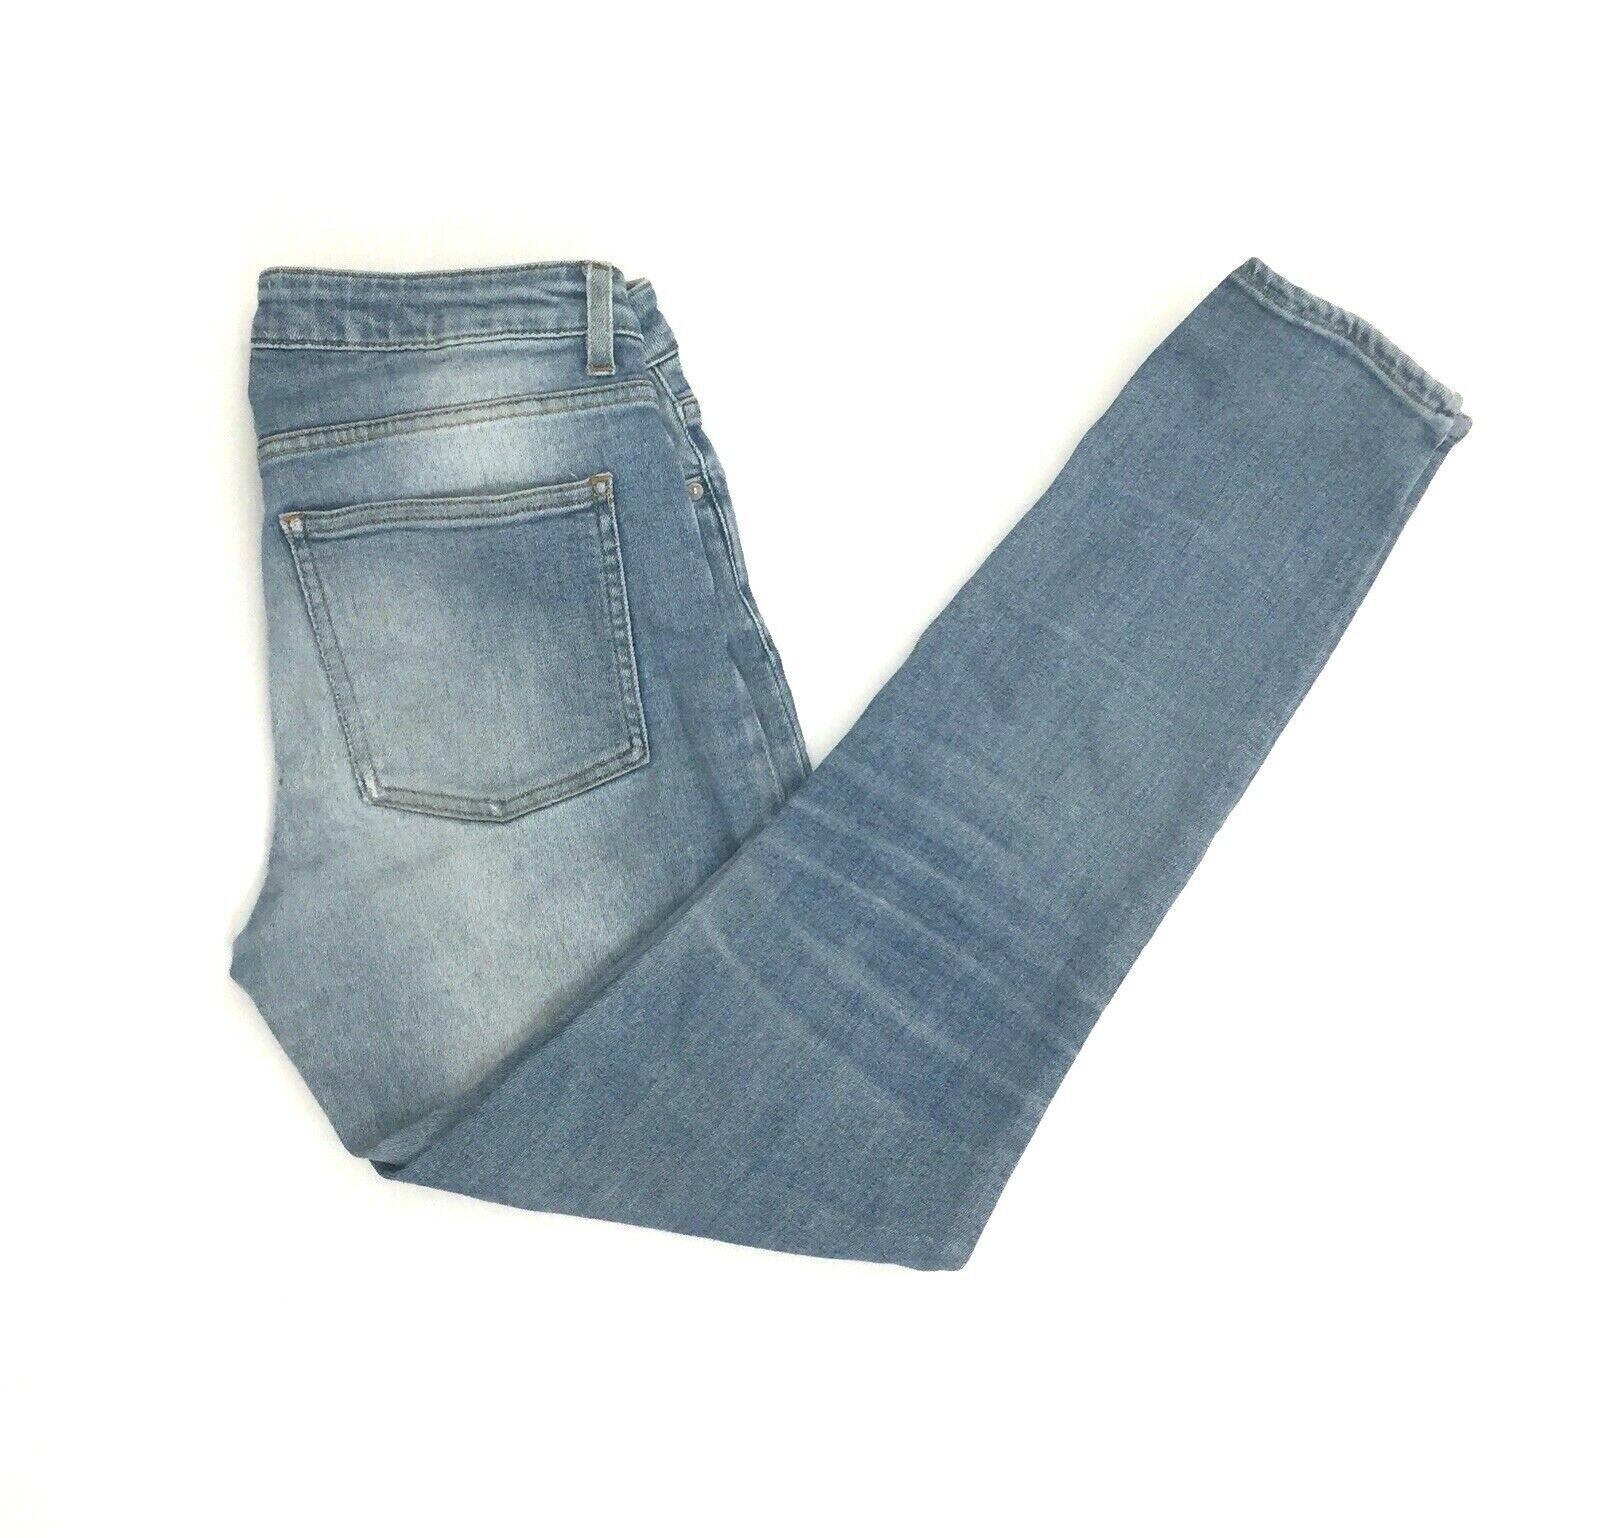 Acne Studios Skin 5 Lt USD blue Womens bluee Jeans Sz 29x32. Fits 28x27